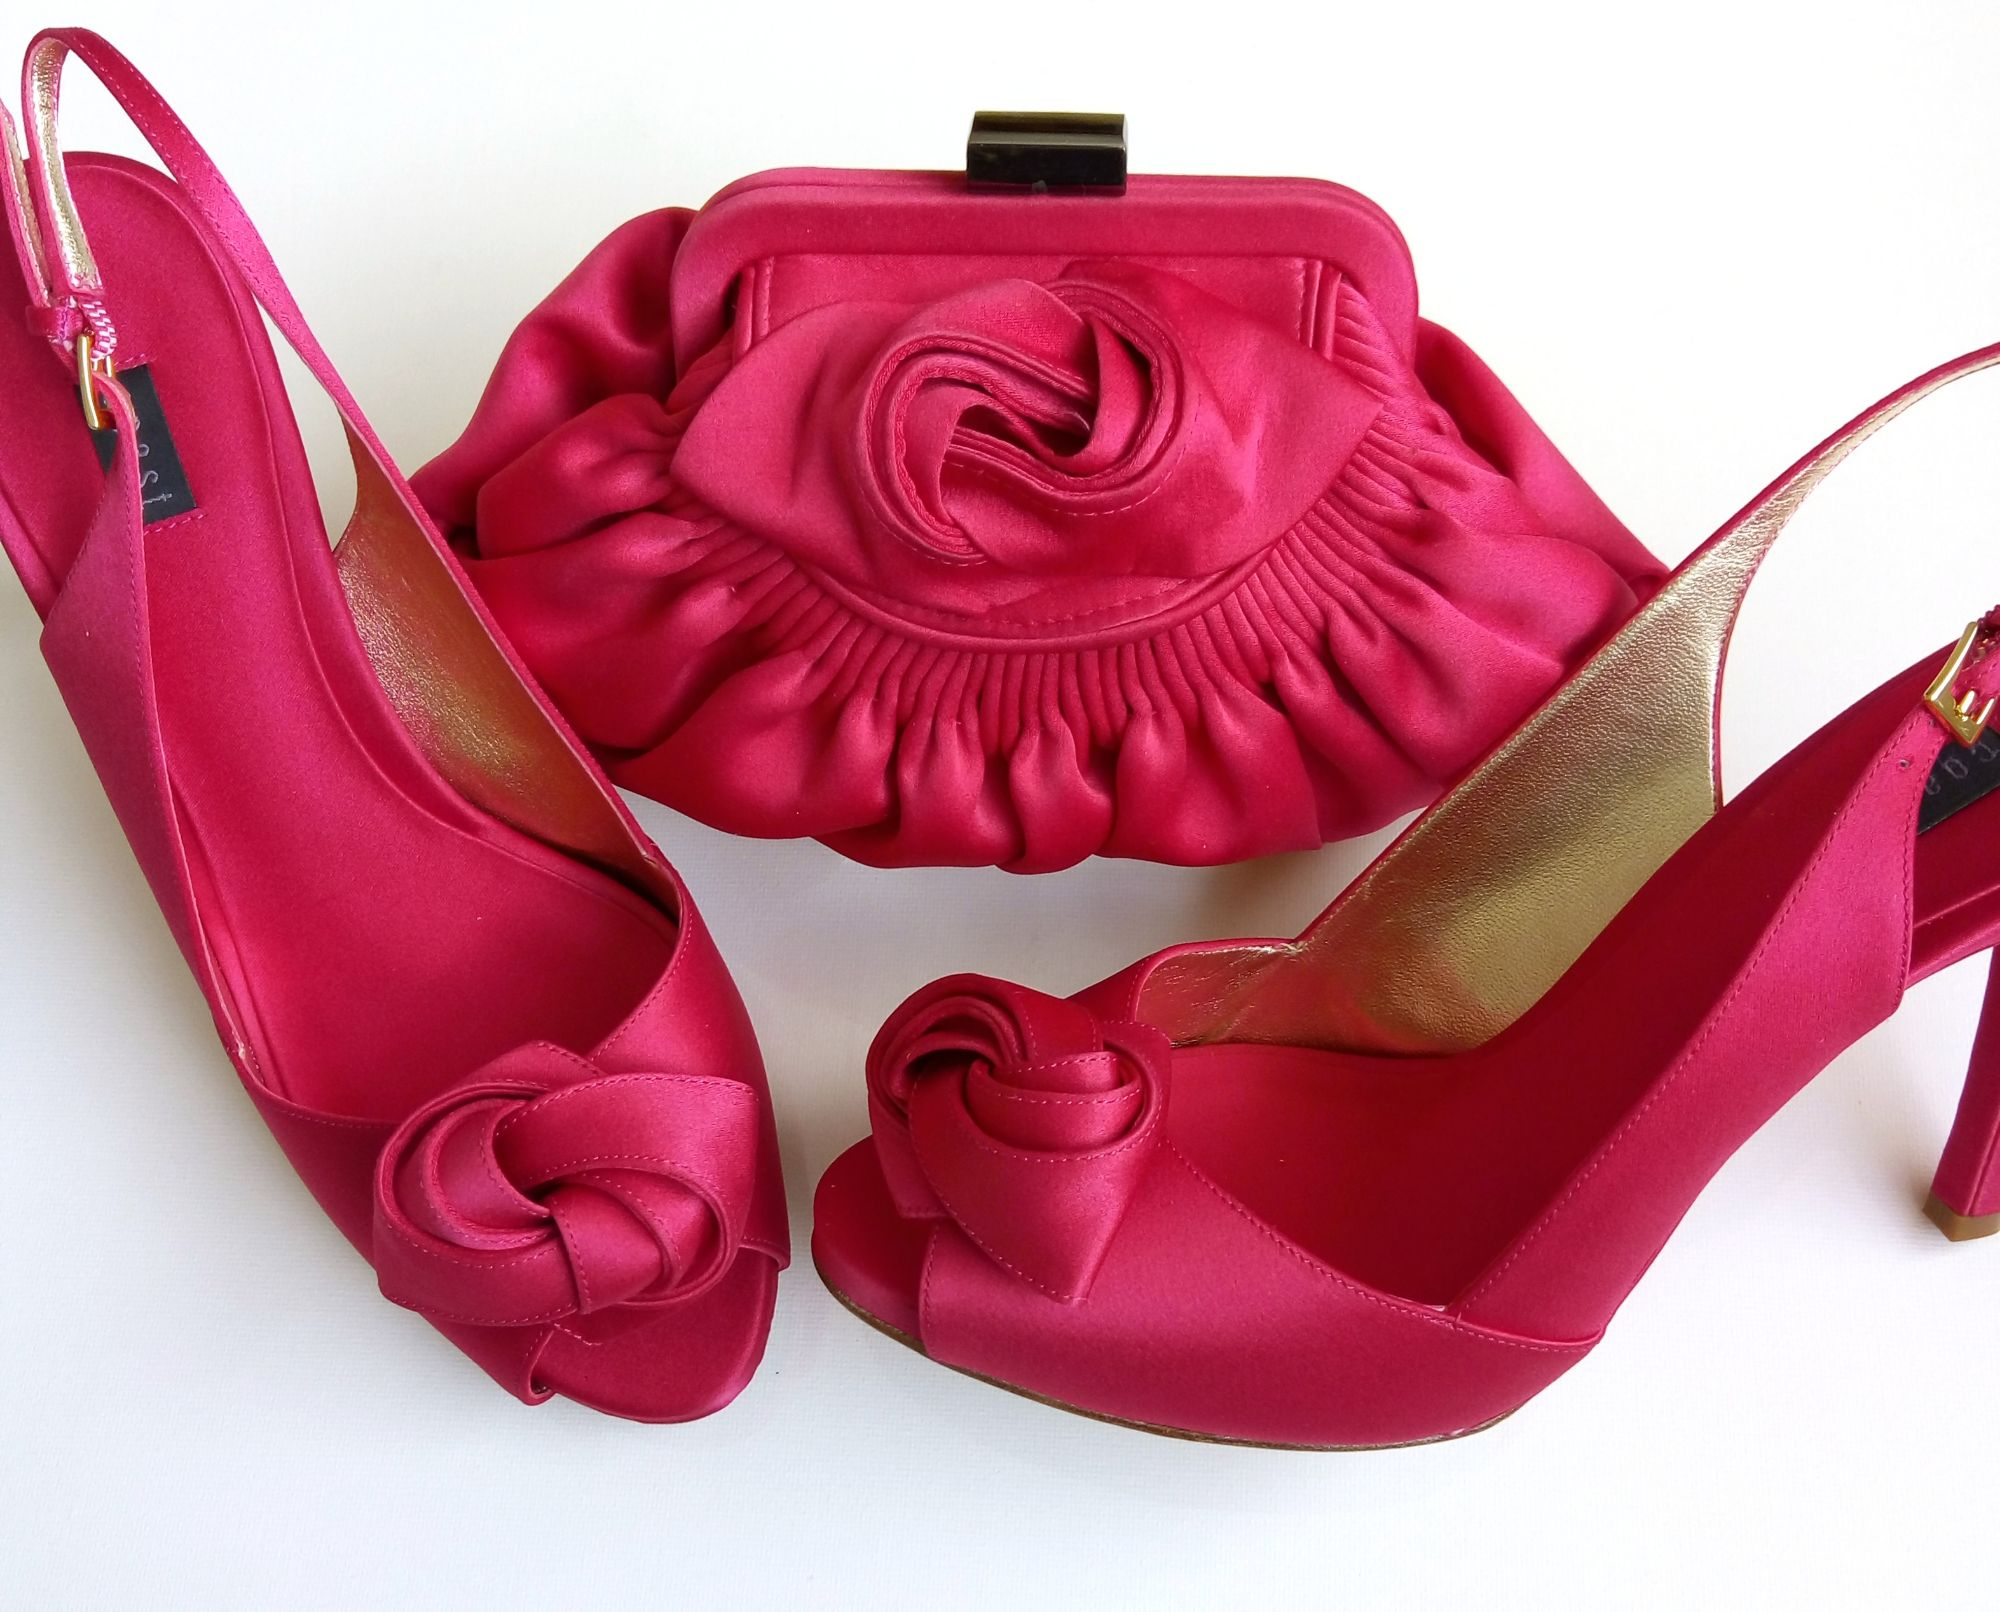 Coast hot pink satin shoes matching bag